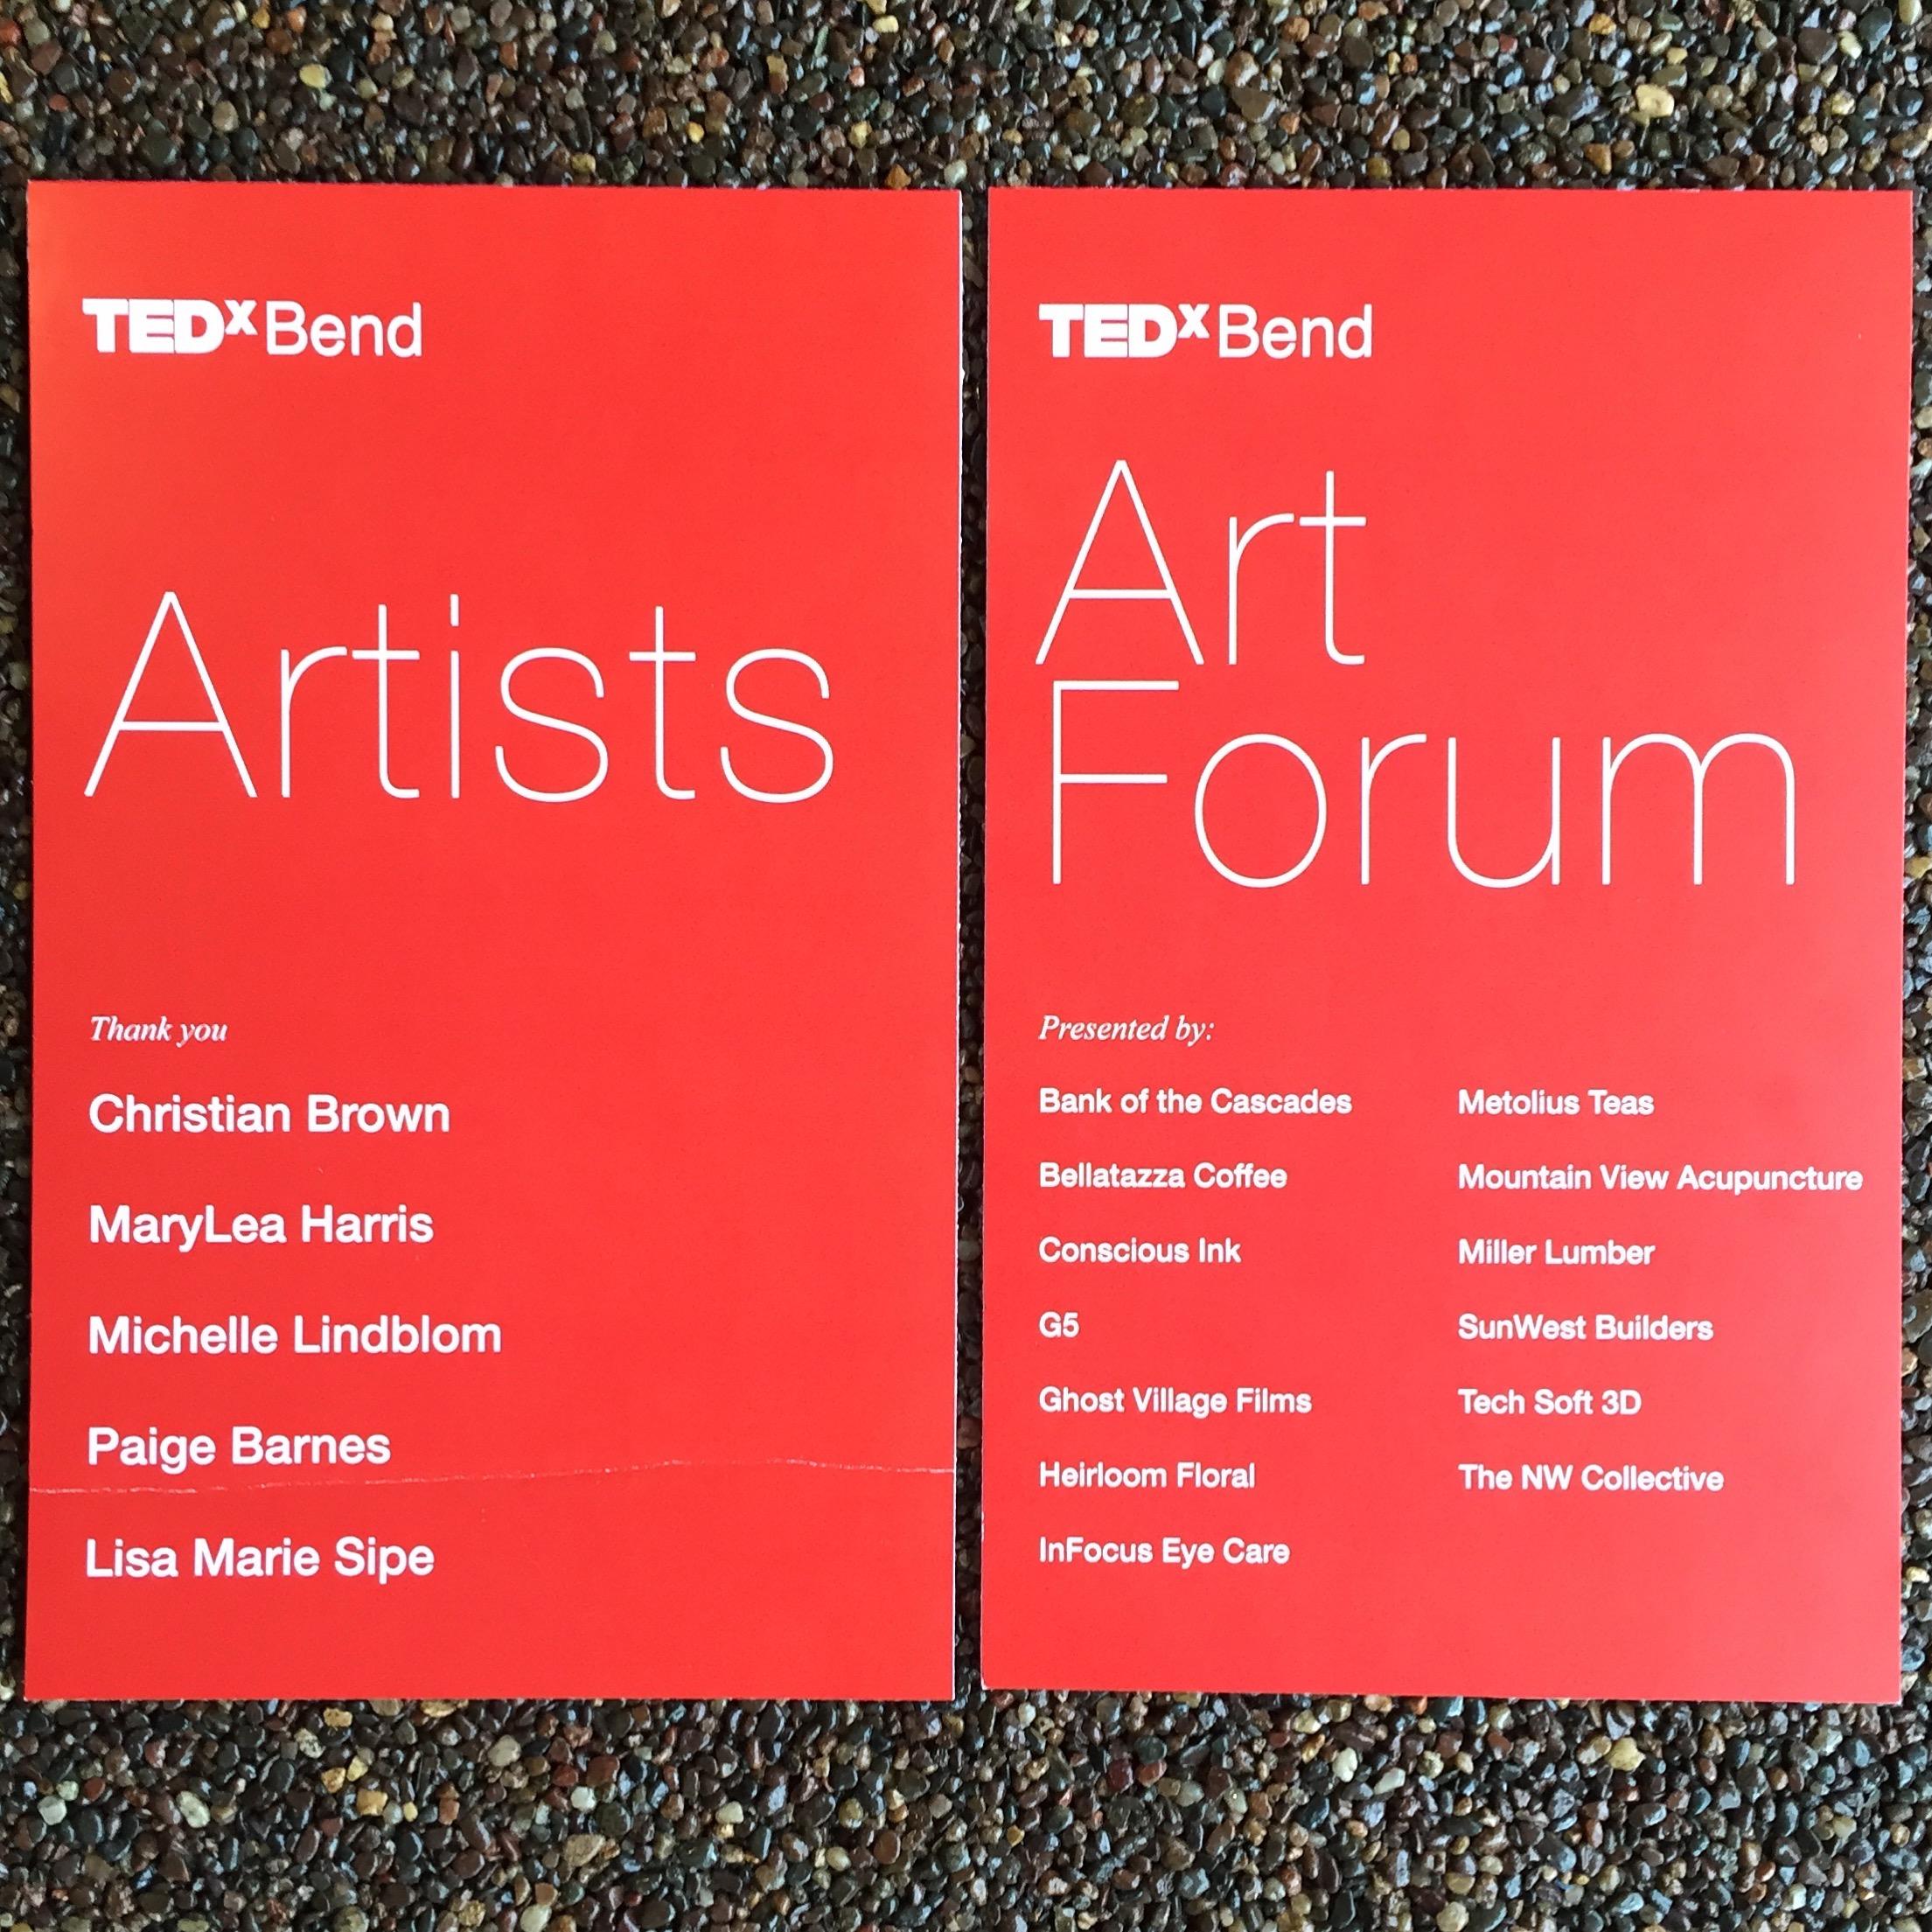 TEDxBendSignMaryLeaHarrisART